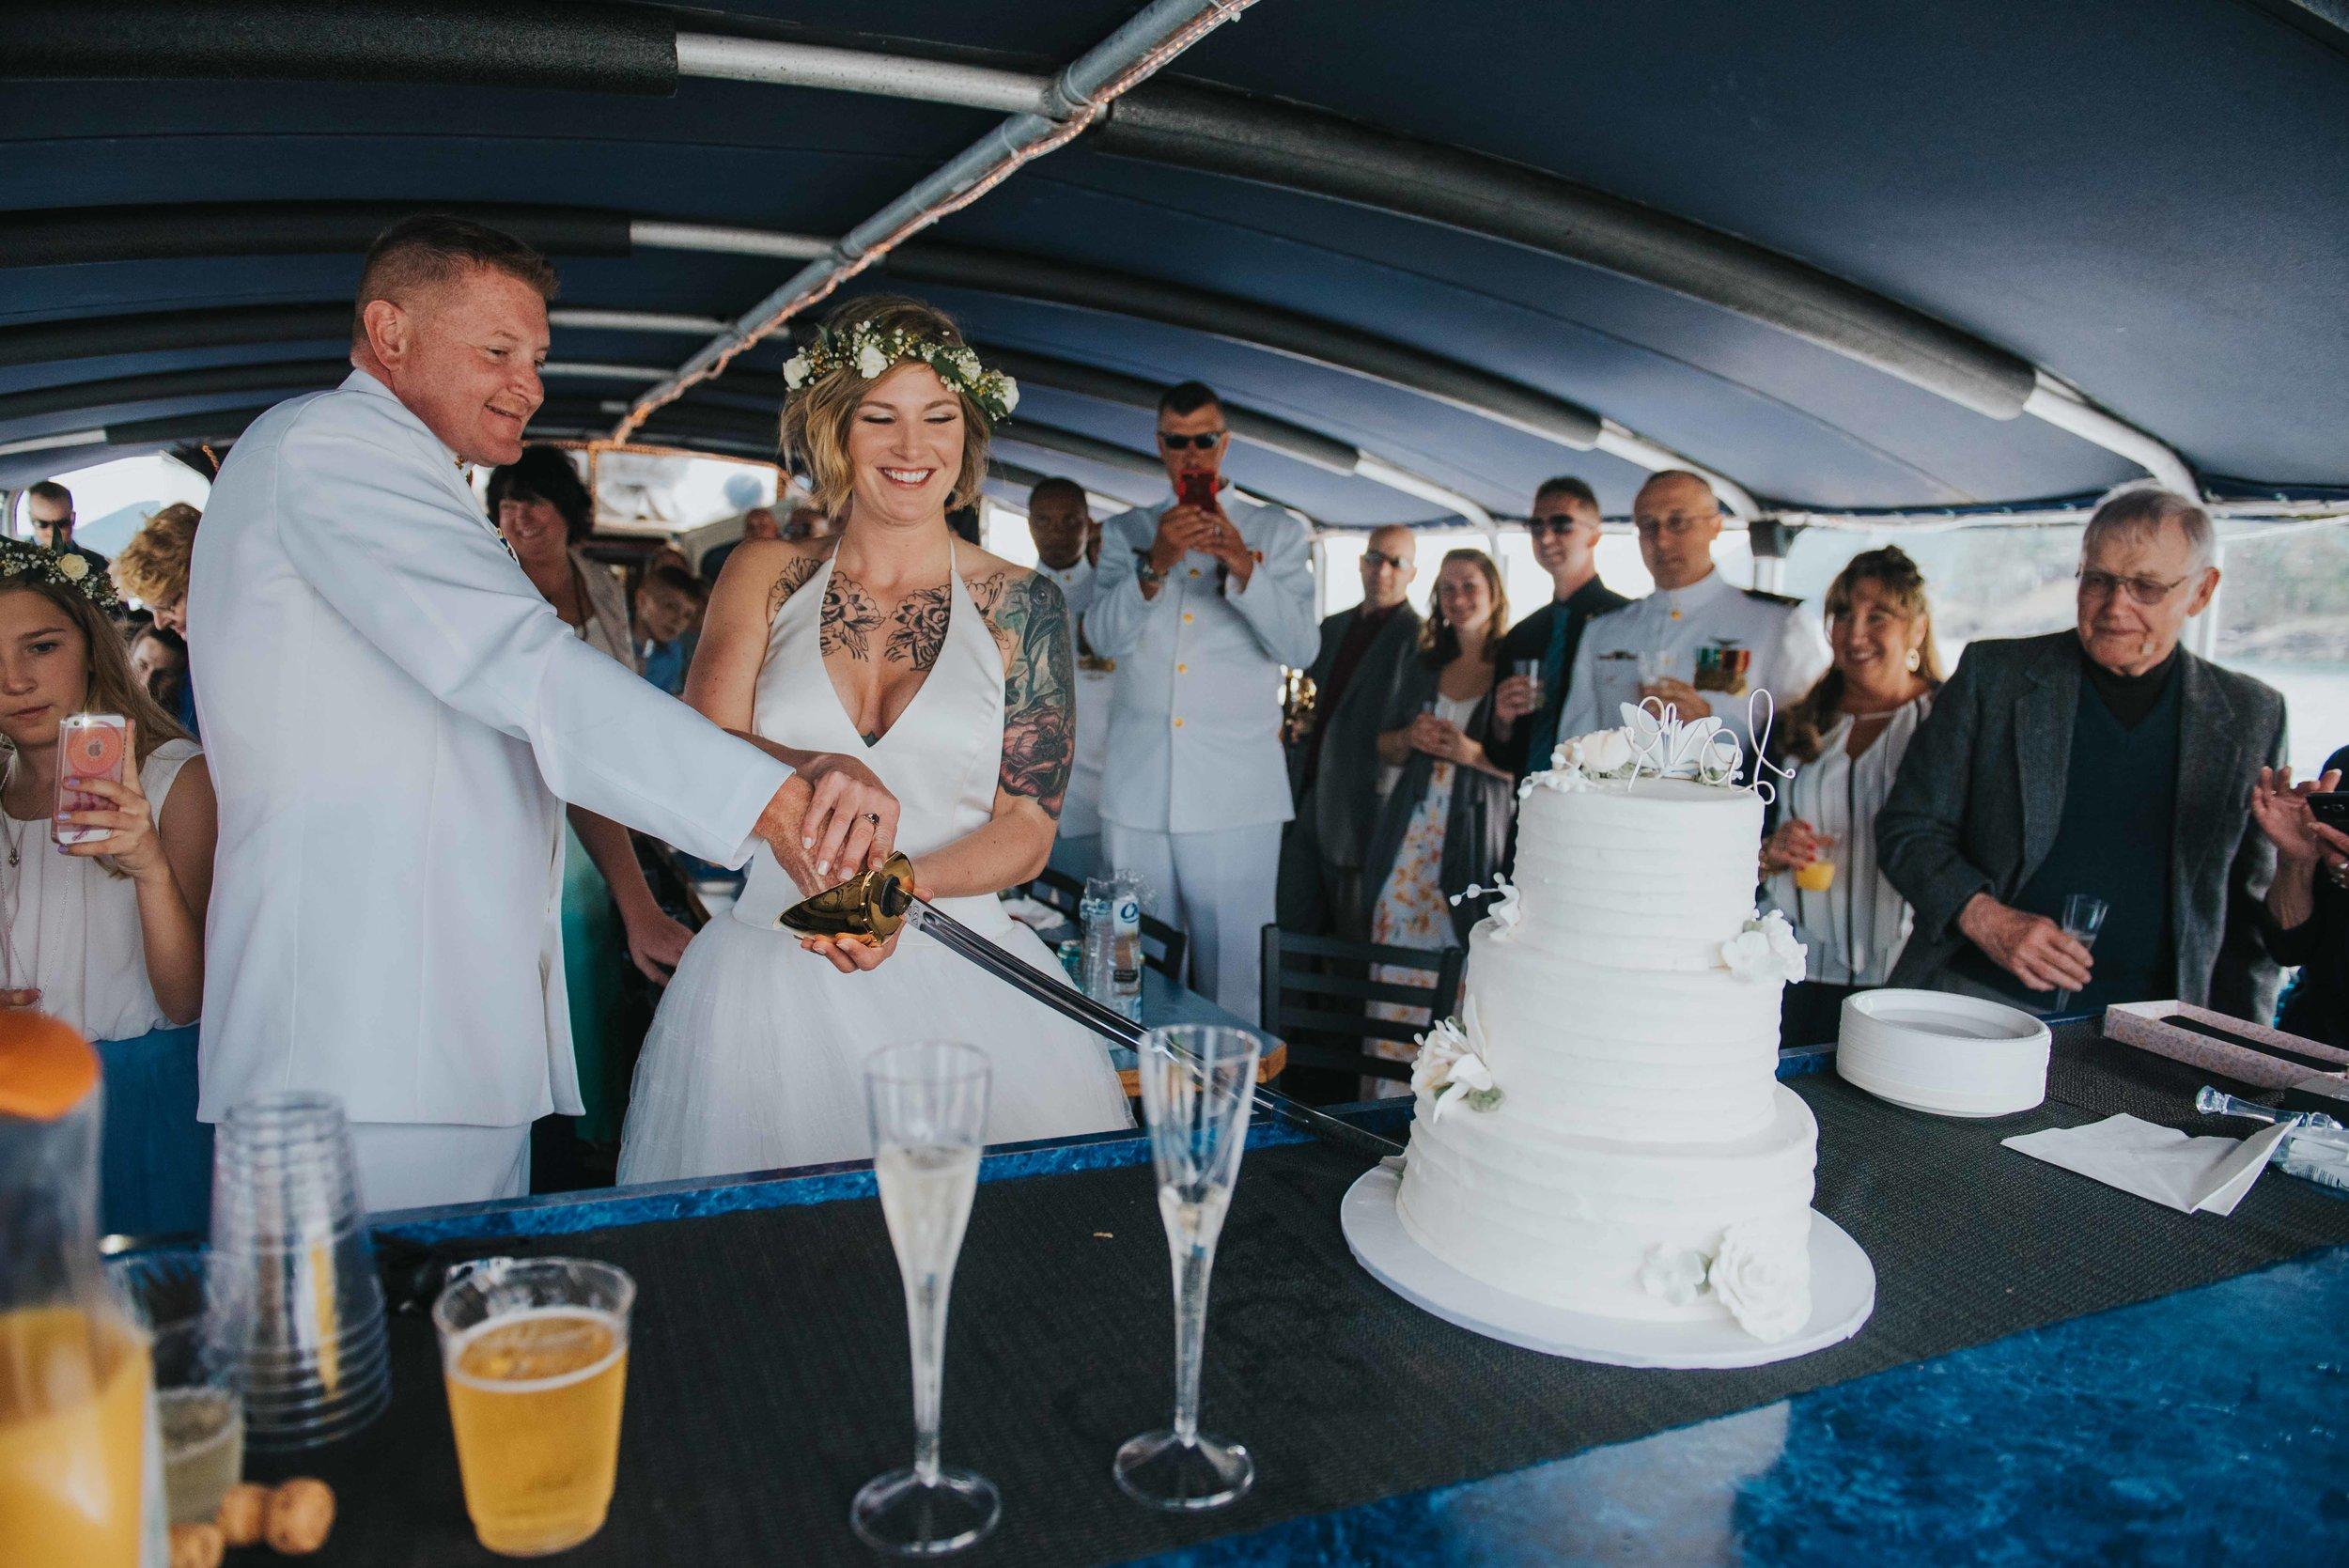 SSPNW-Wedding-Photographer (1 of 1).jpg